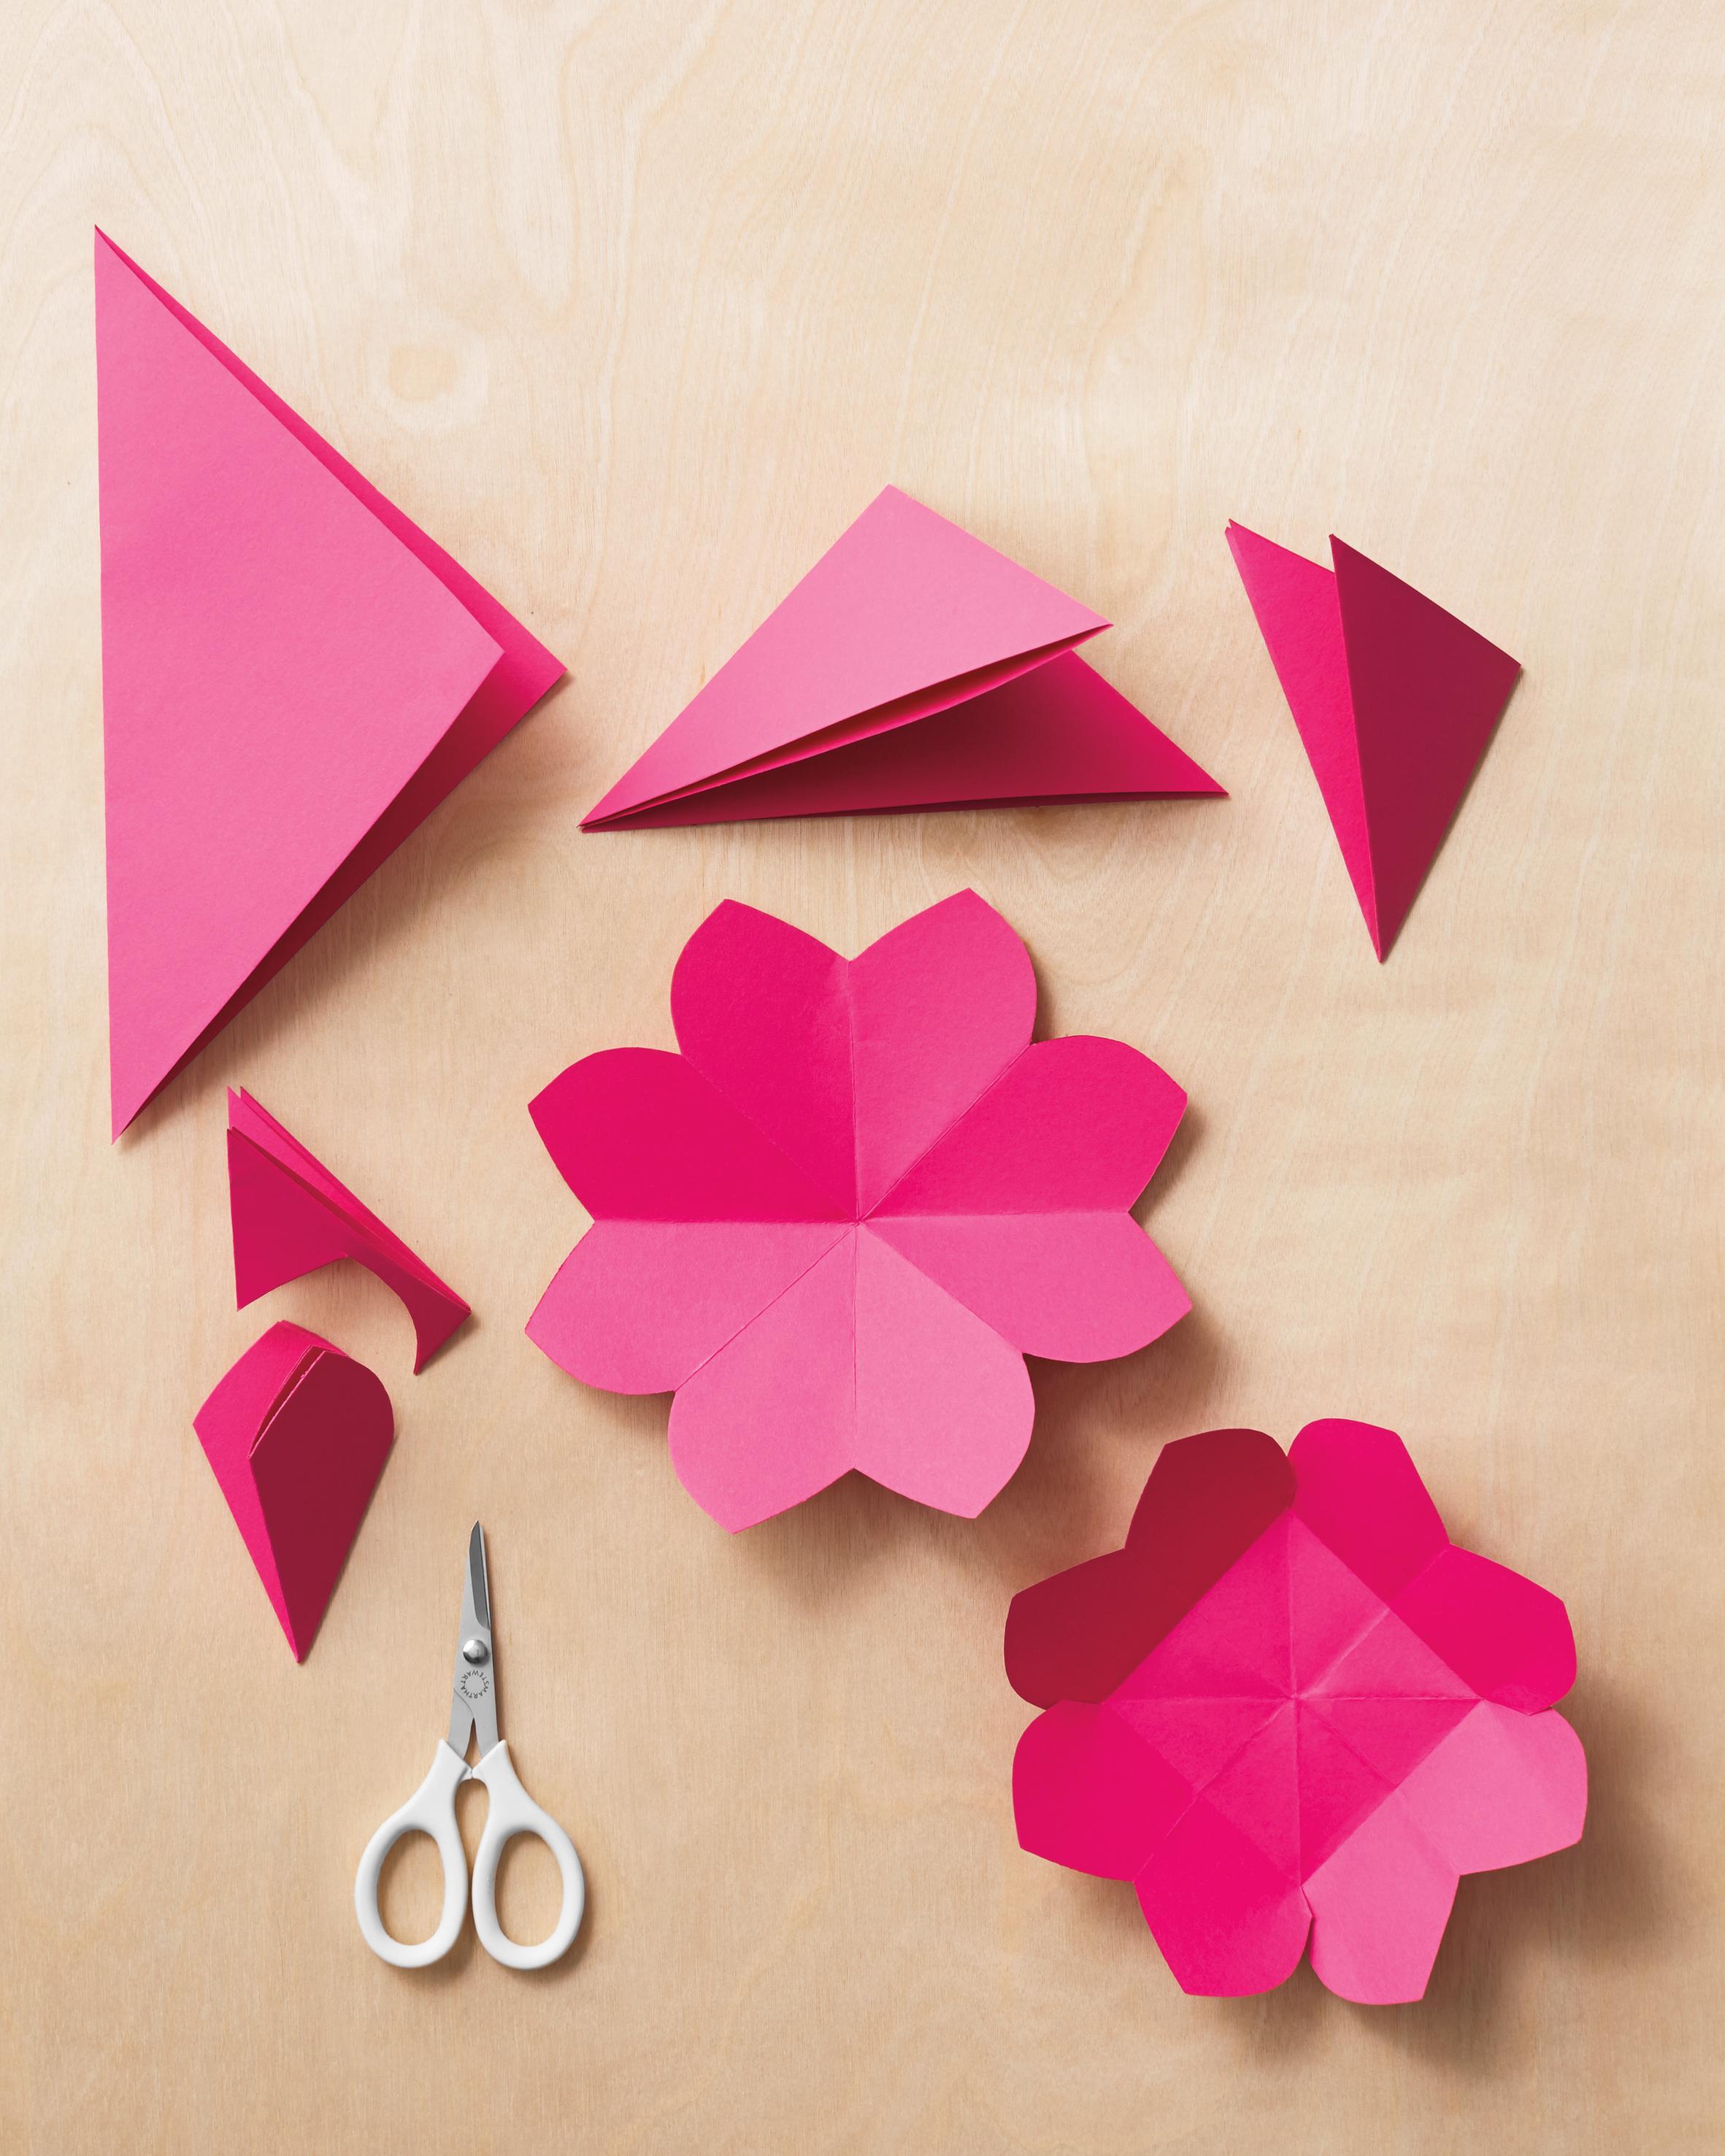 origami-165-mwd110795.jpg